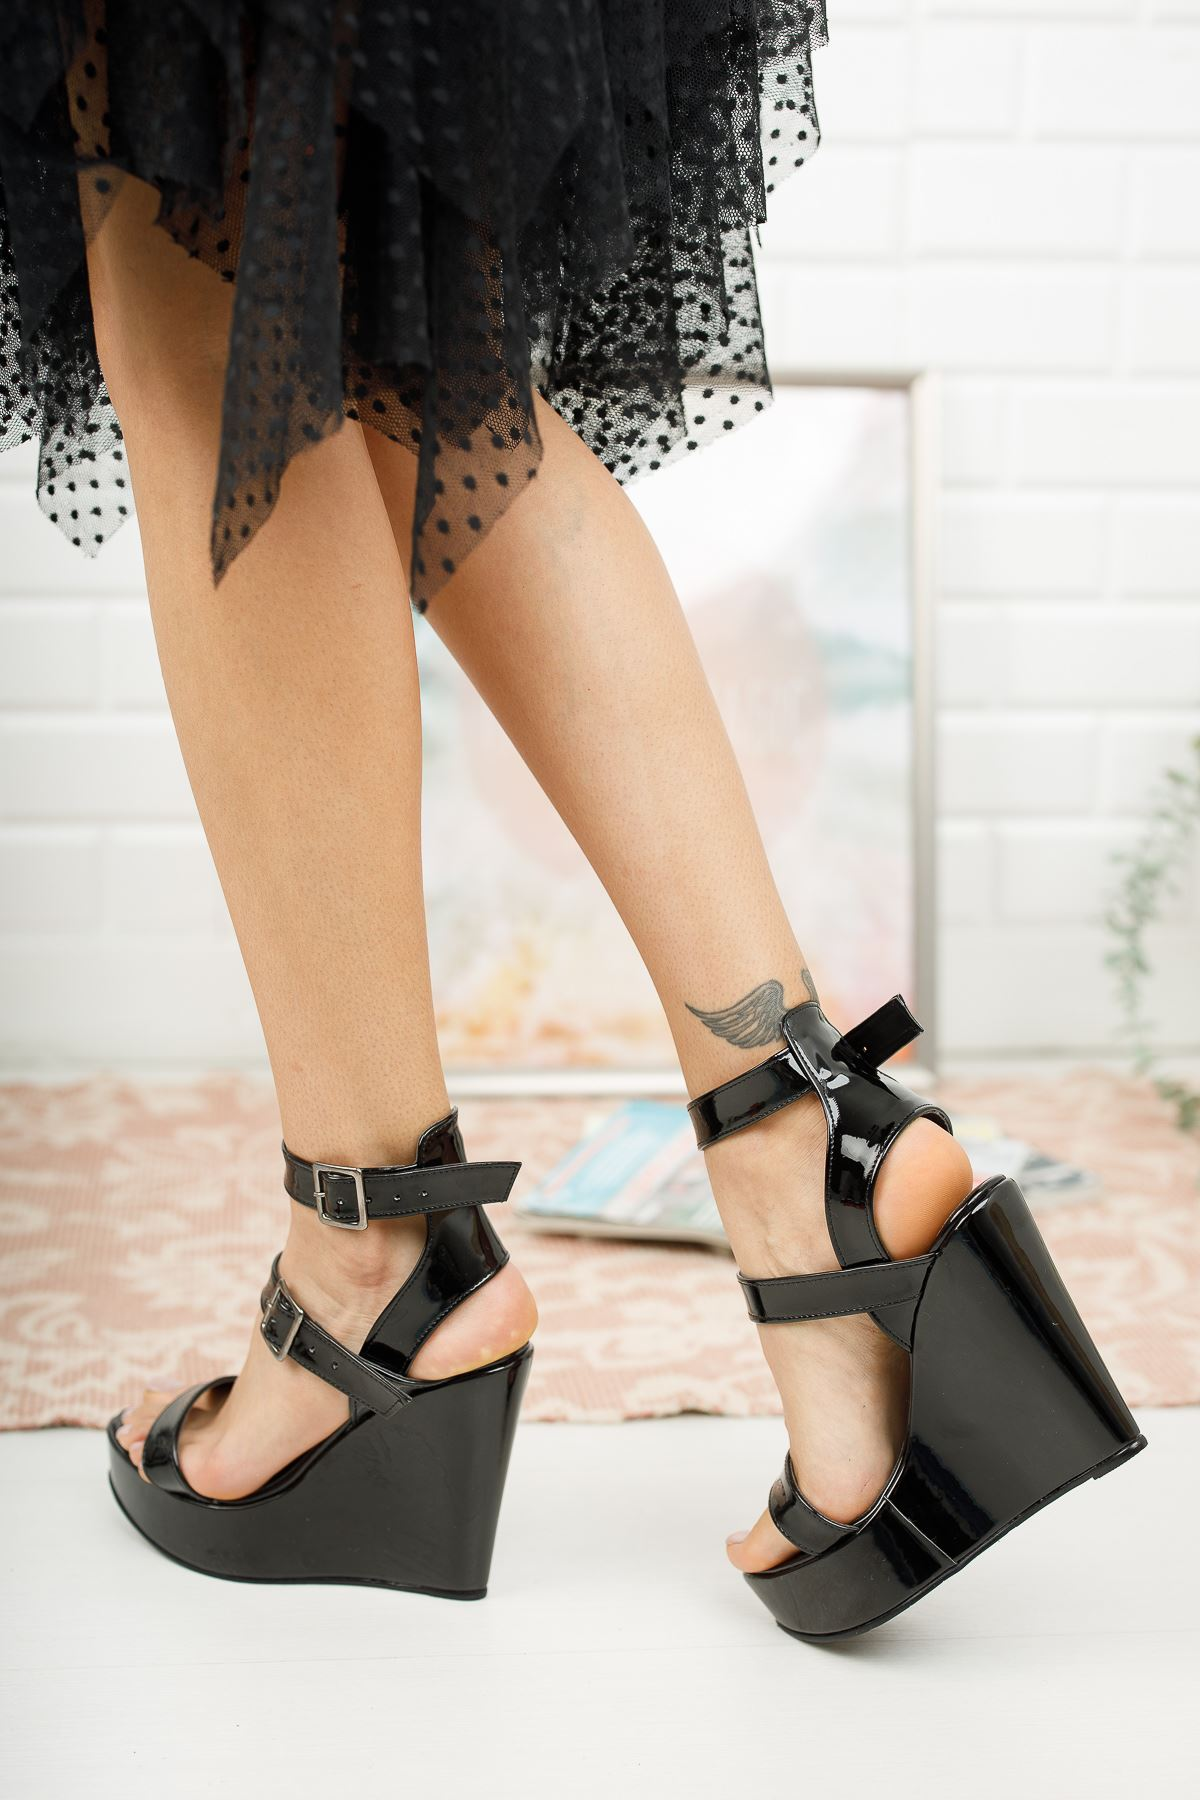 Katie Siyah Rugan Dolgu Topuklu Ayakkabı